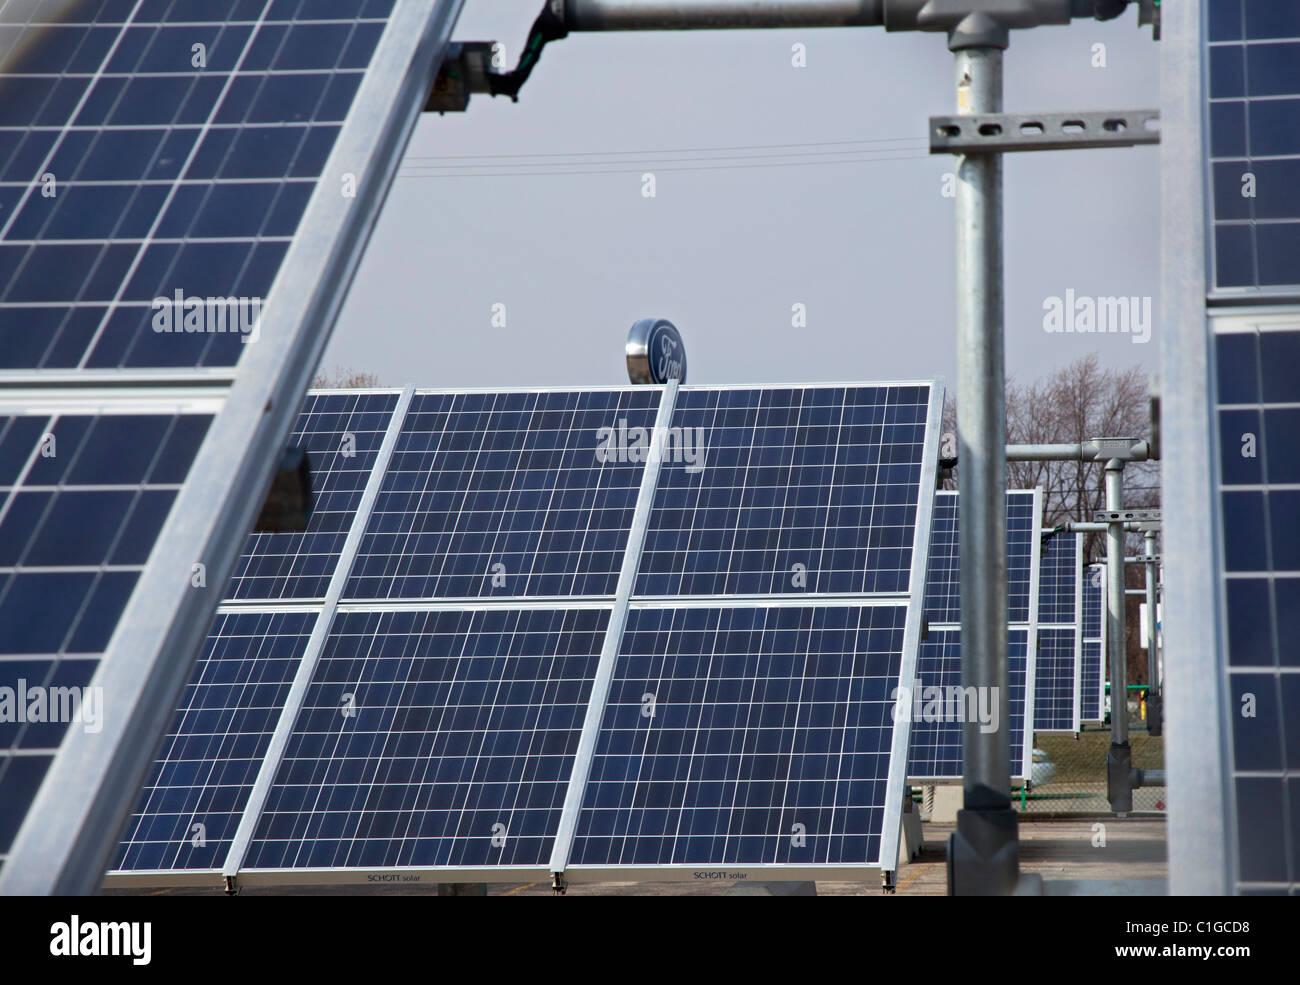 Wayne michigan a 500 kilowatt solar array helps power for Ford motor company wayne mi